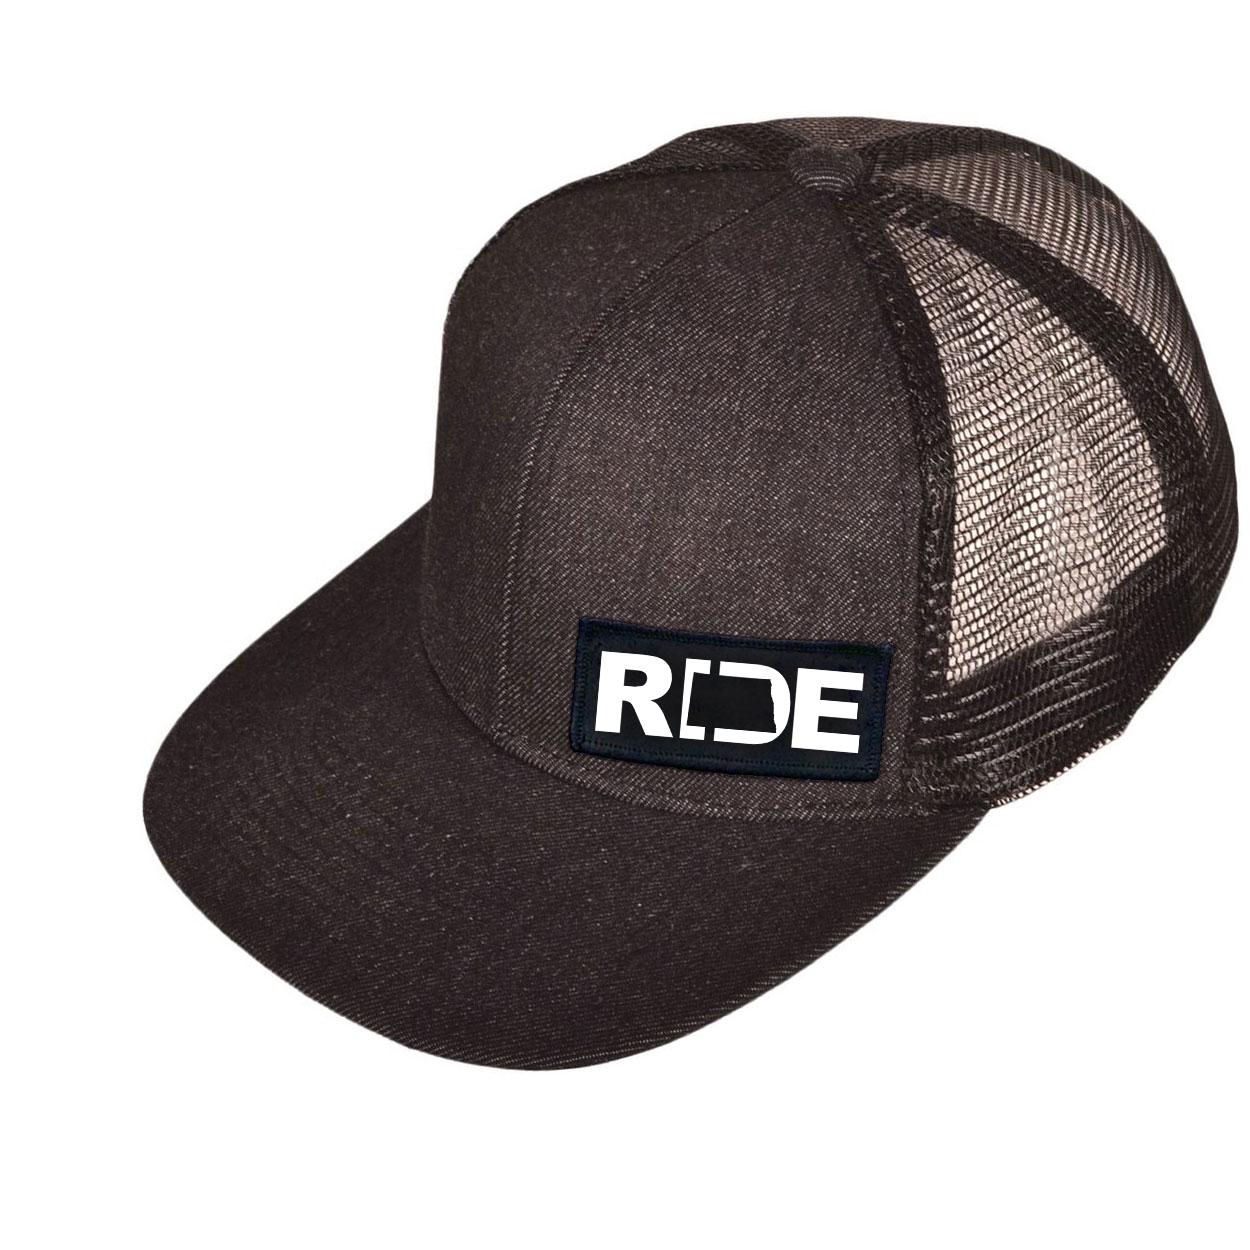 Ride North Dakota Night Out Woven Patch Snapback Flat Brim Hat Black Denim (White Logo)